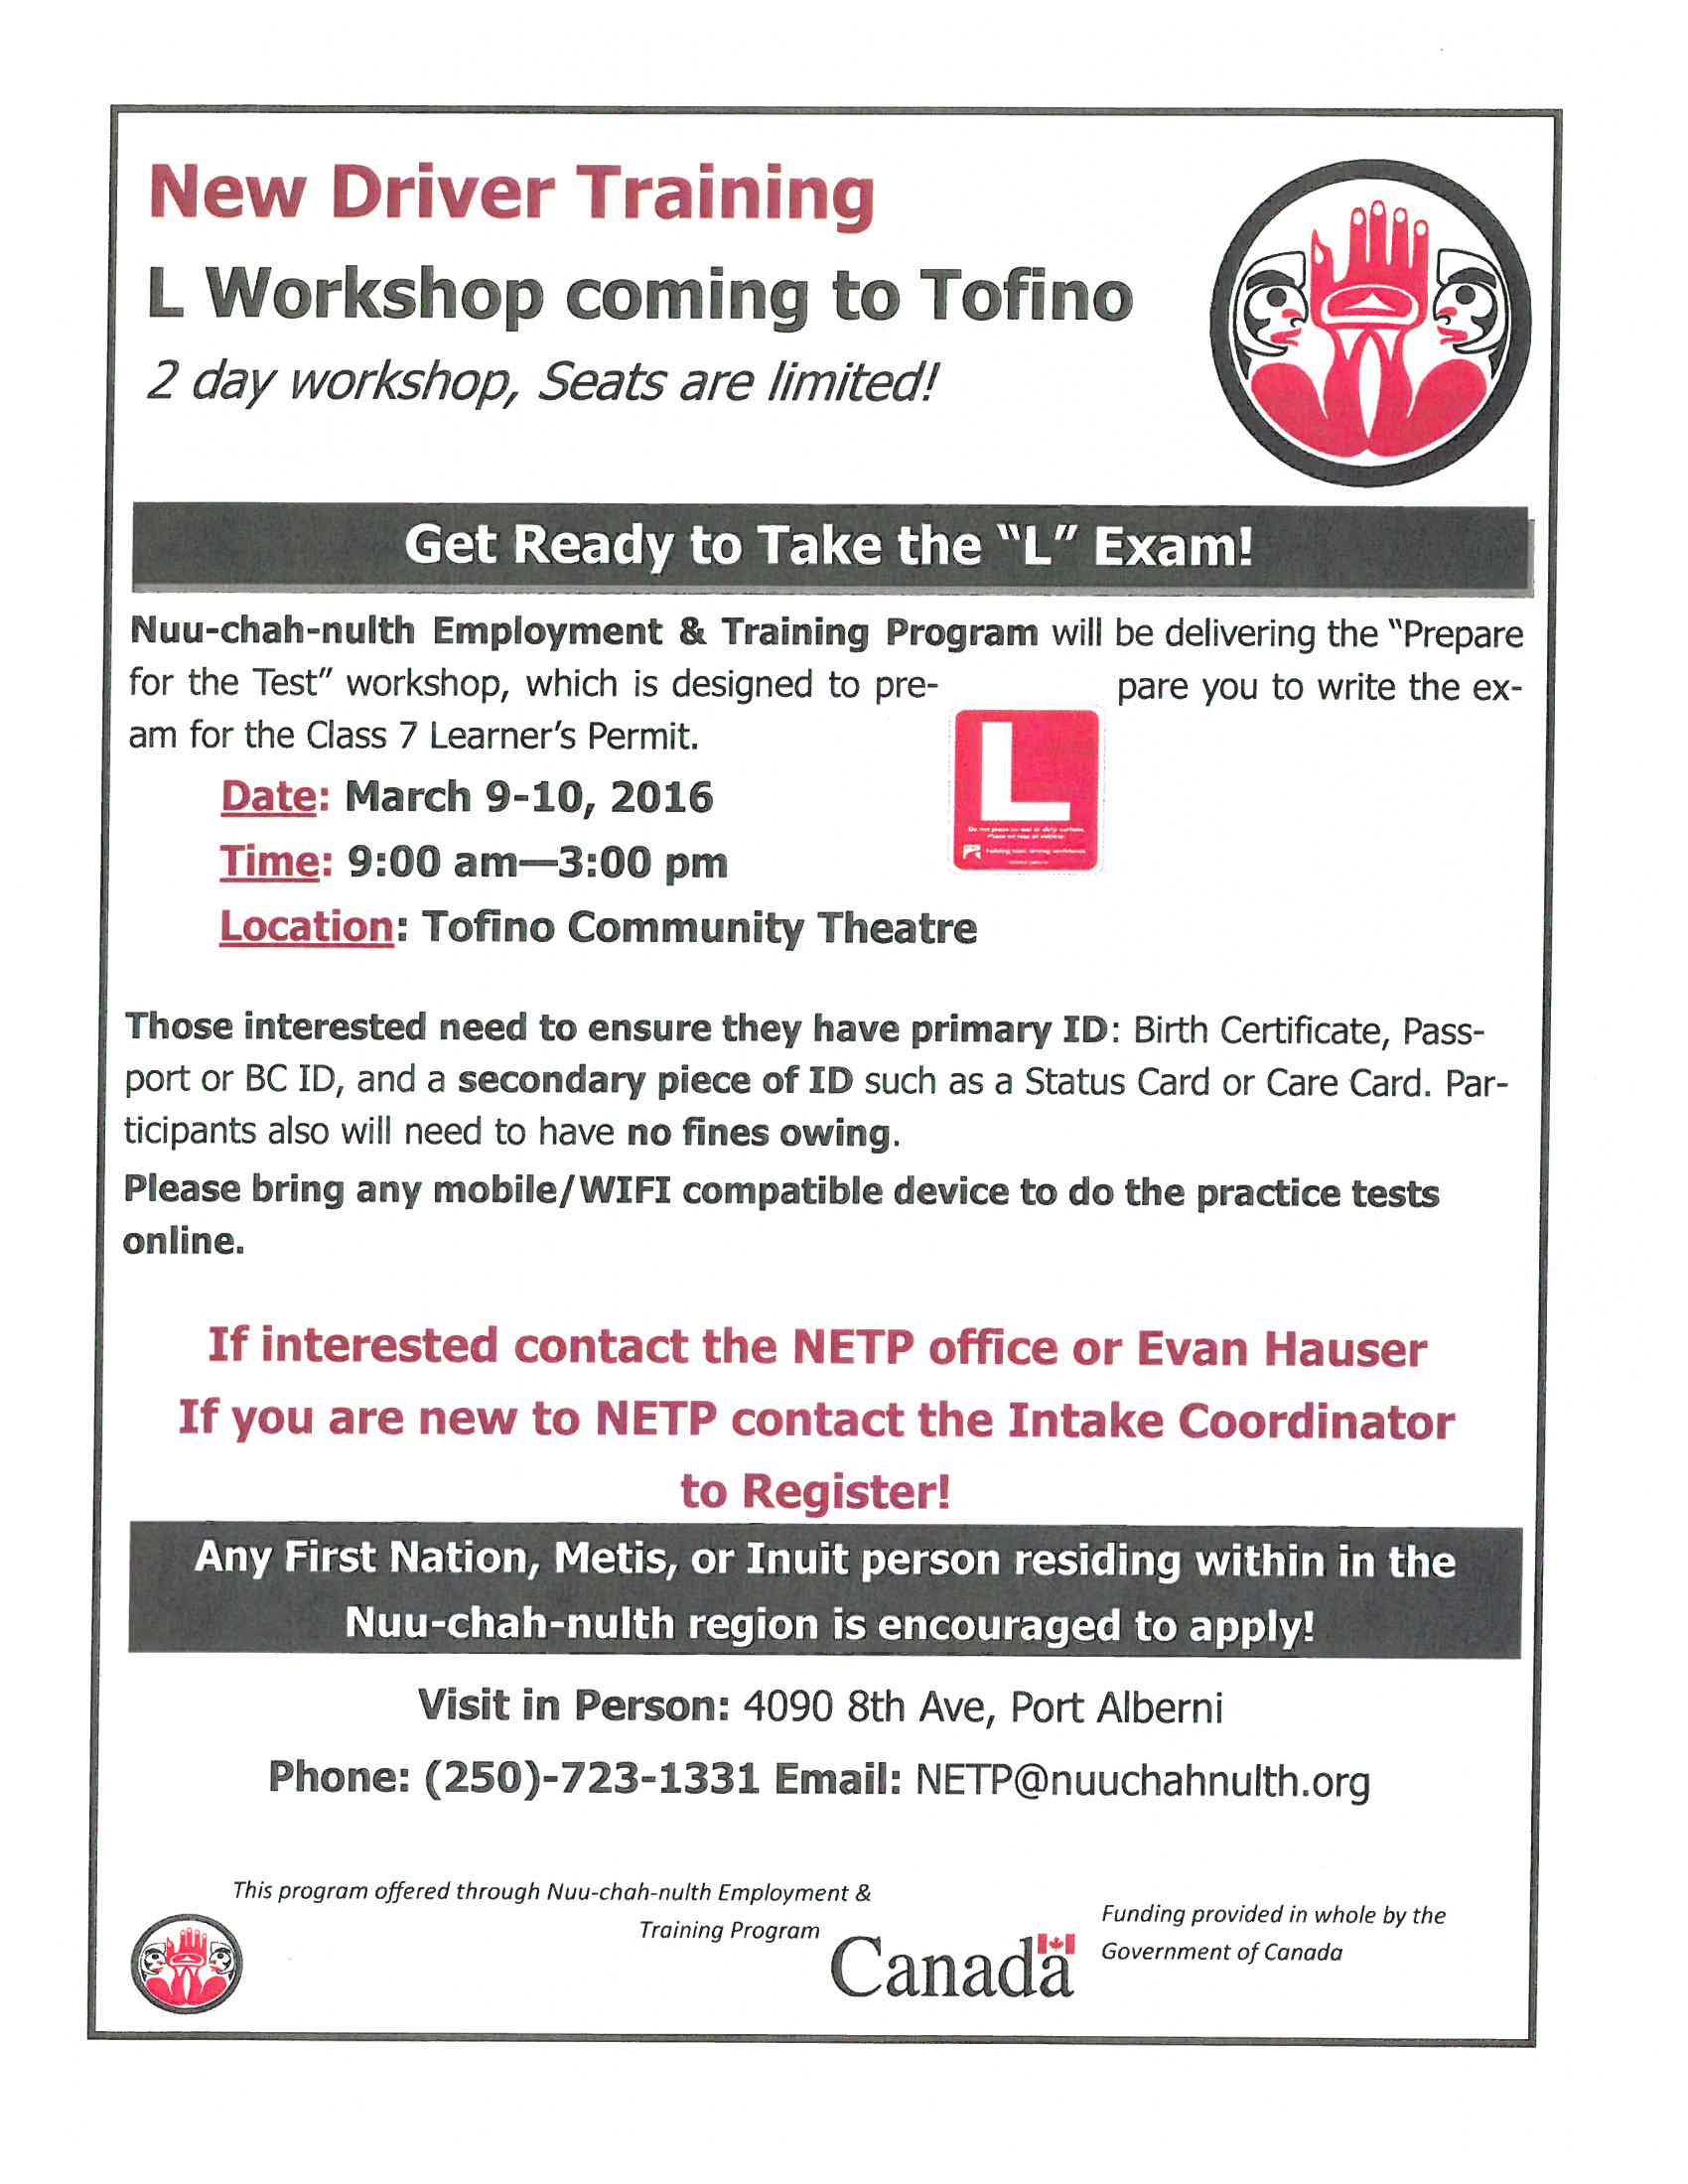 TFN Bulletin Mar 1-2016_Page_18.jpg